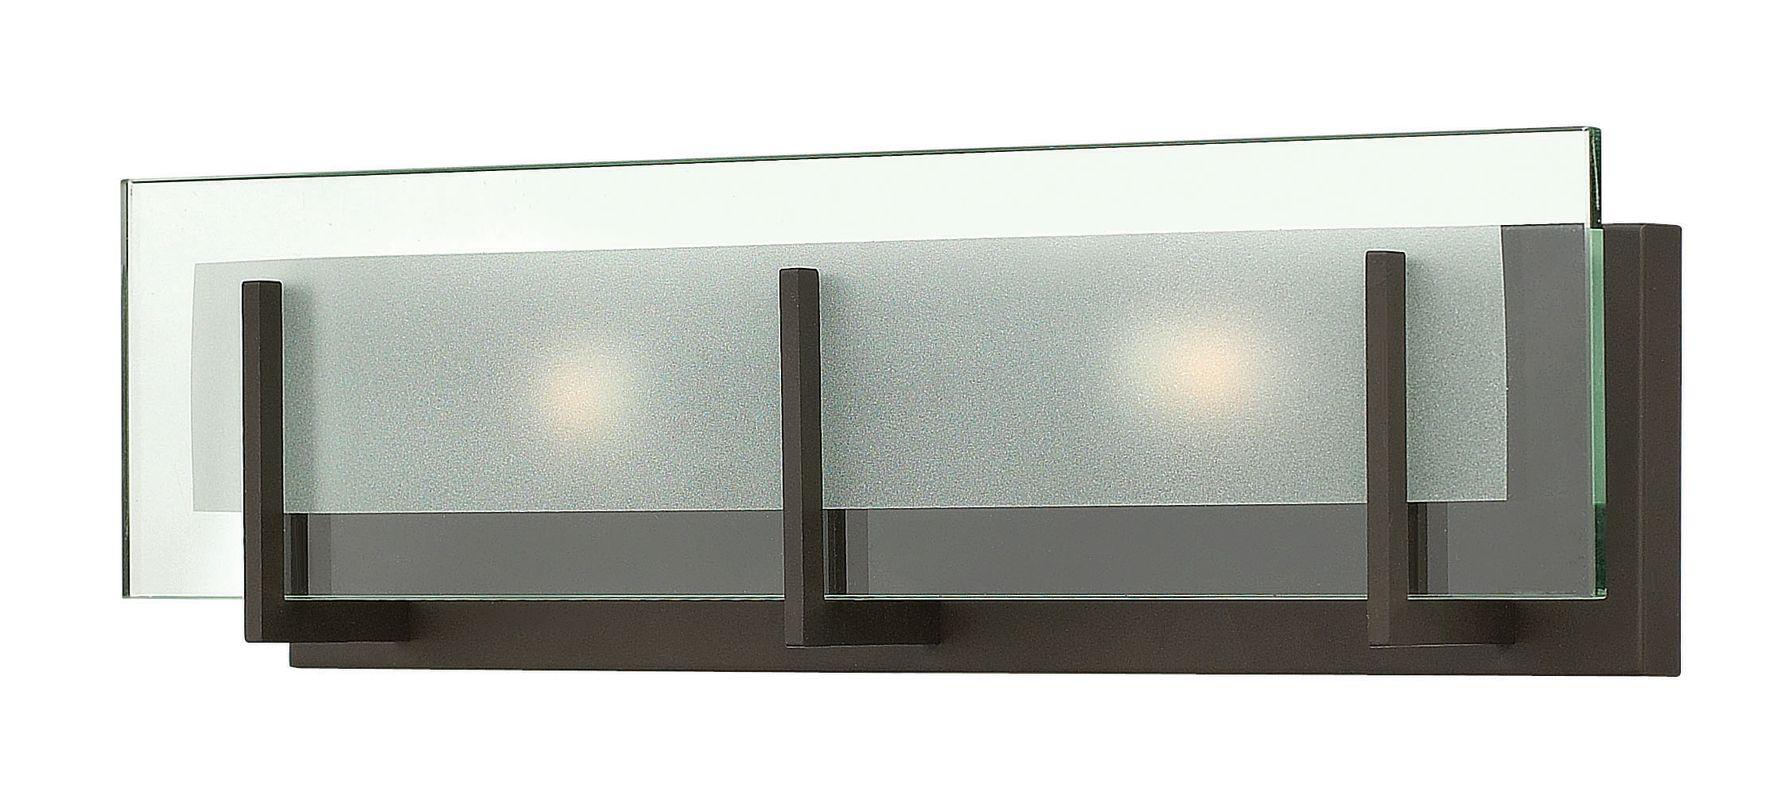 "Hinkley Lighting 5652 2 Light 18"" Width ADA Compliant Bath Bar from Sale $165.00 ITEM#: 2635589 MODEL# :5652OZ UPC#: 640665565249 :"